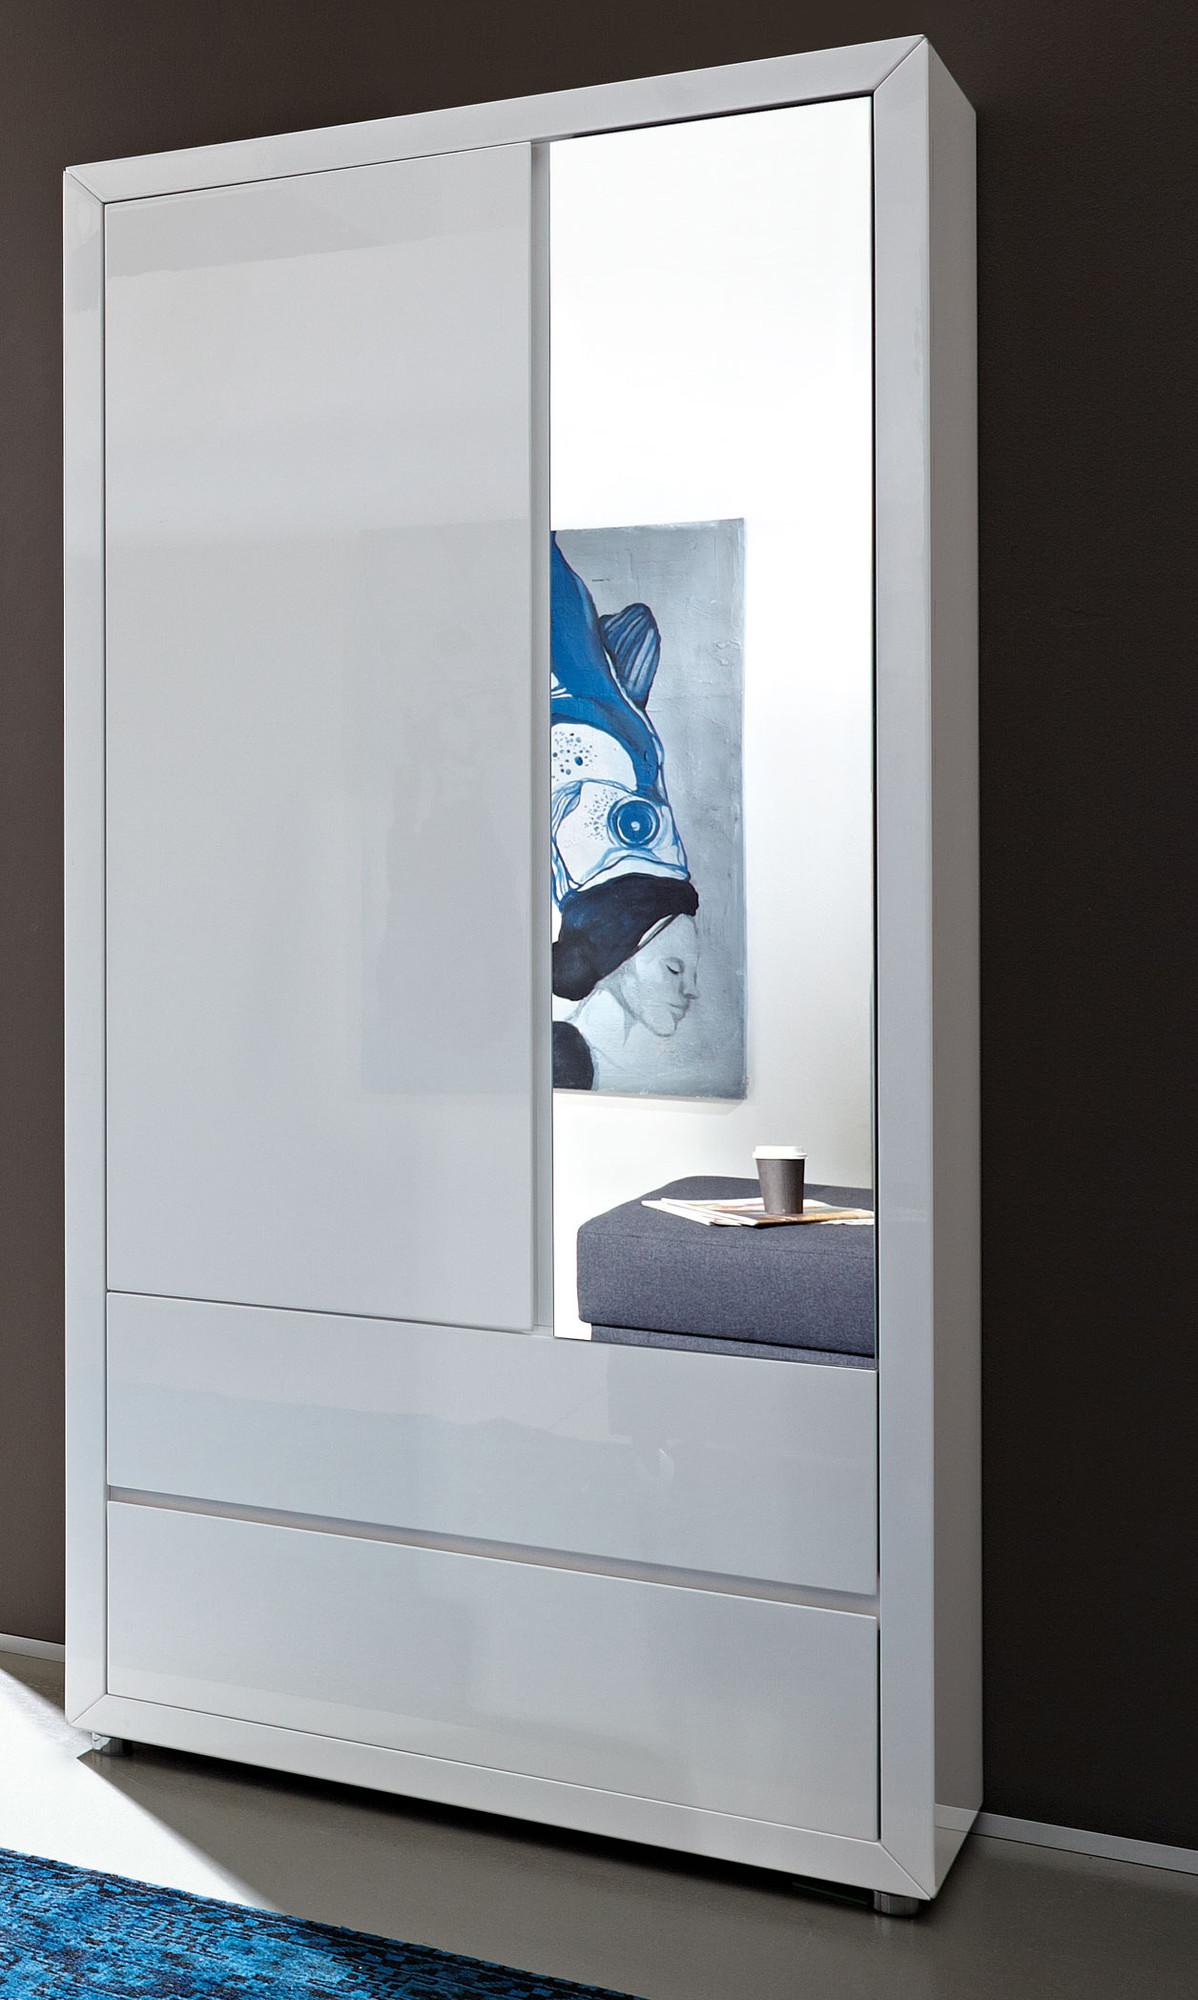 Zwevende kast tv meubel hoogglans herning aanbieding kopen - Eigentijdse designkast ...